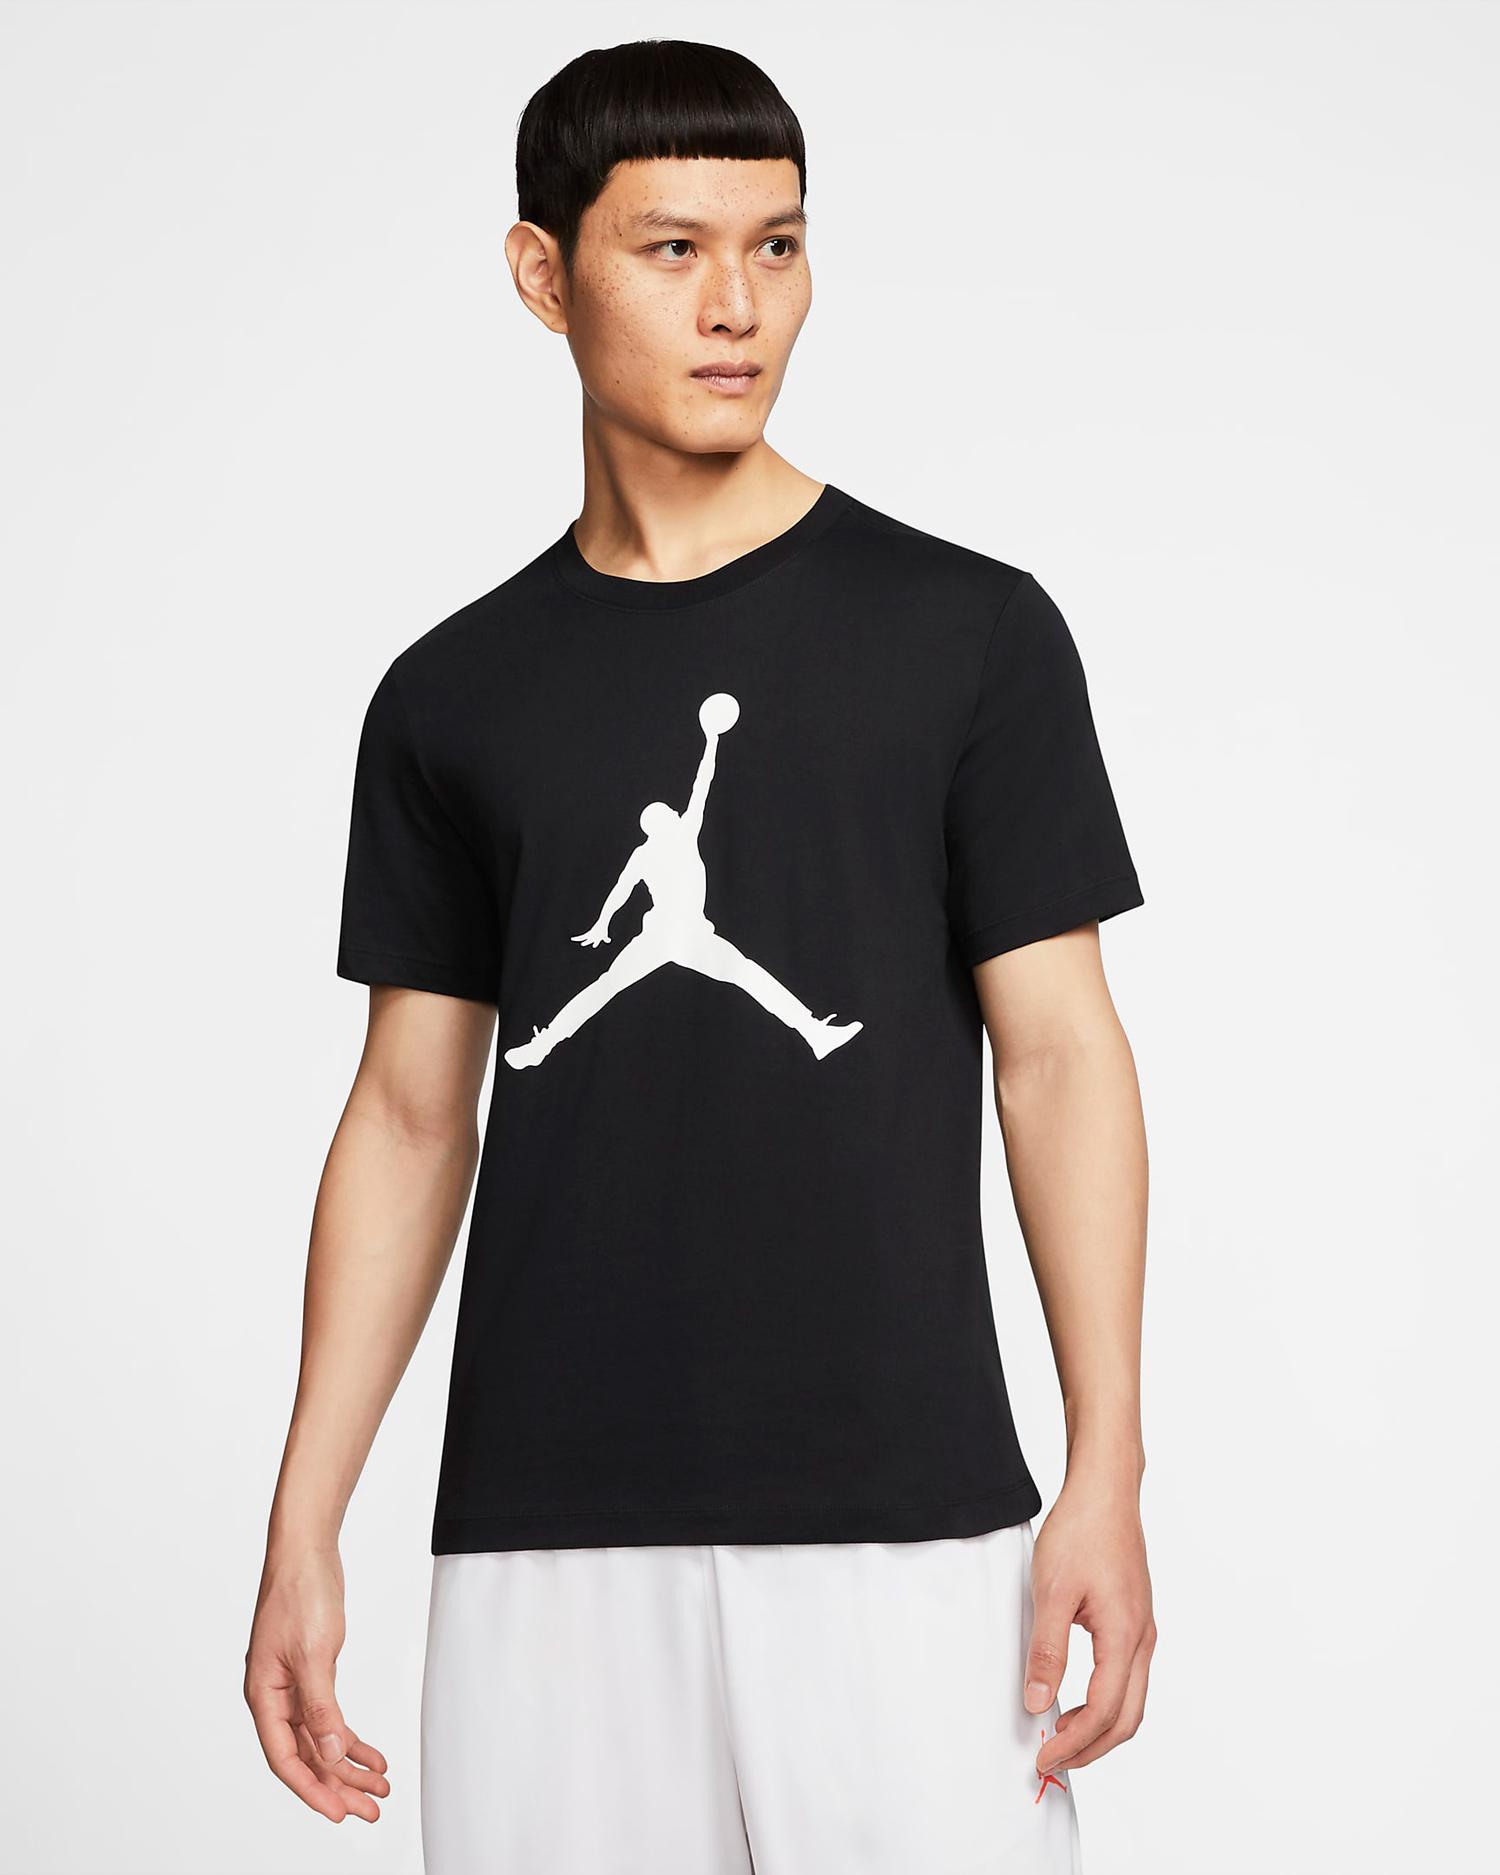 jordan-jumpman-t-shirt-black-white